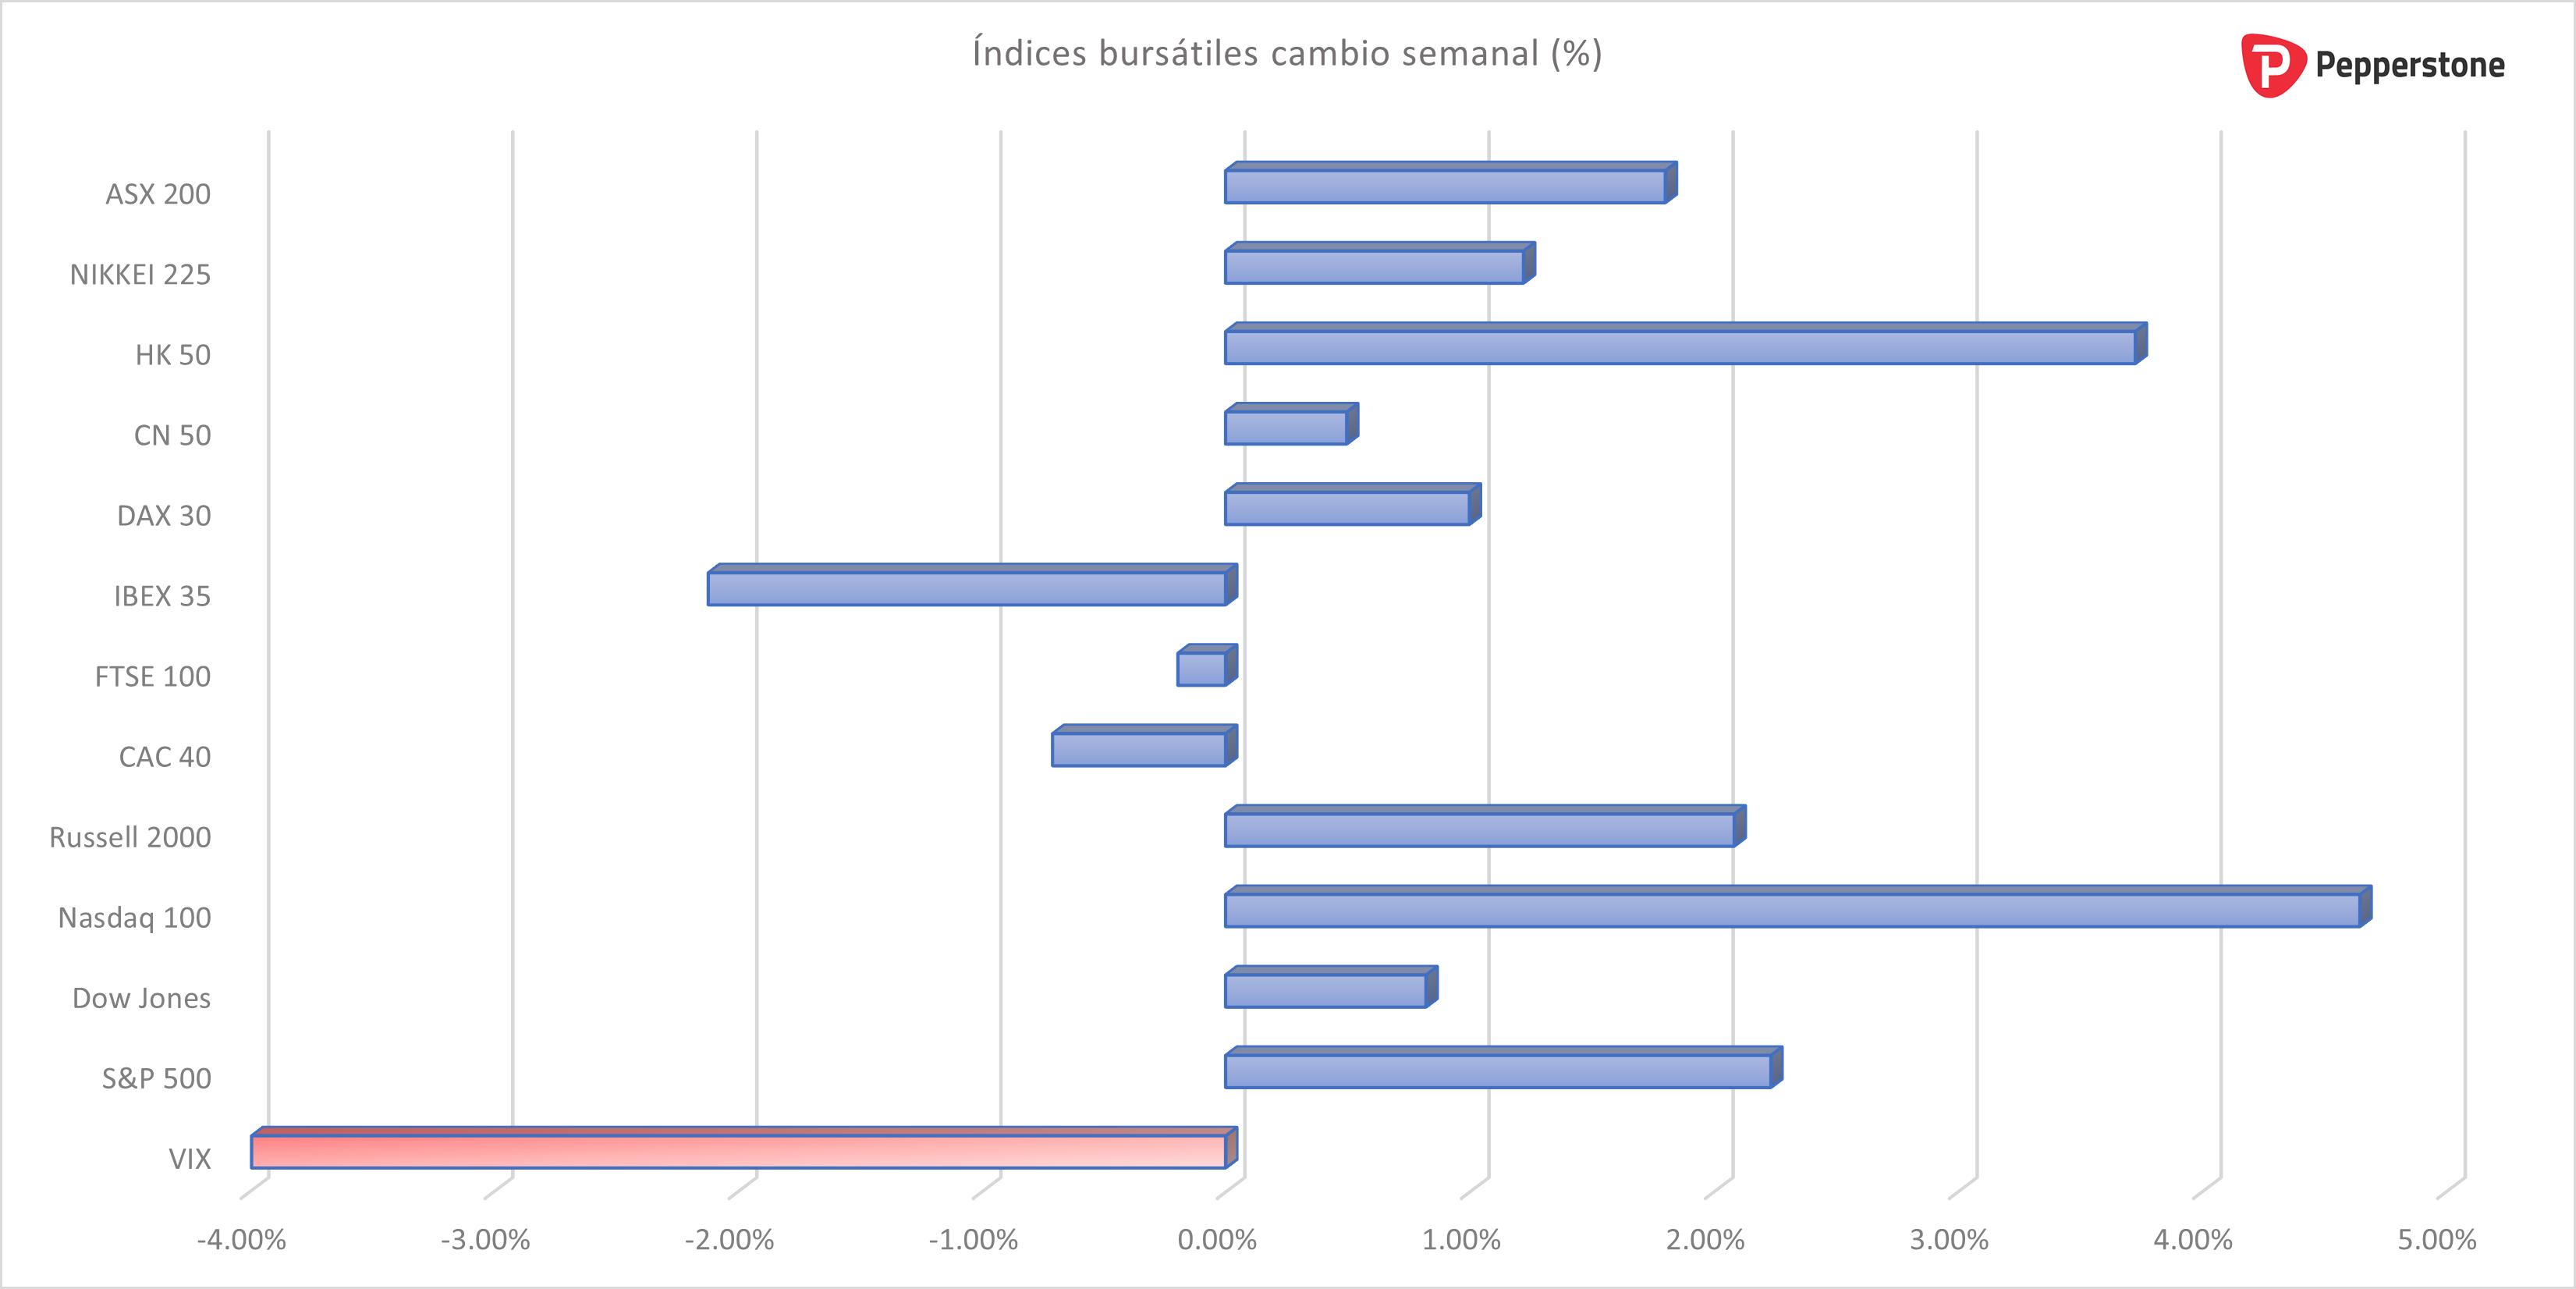 Indices_bursatiles_semanal.png